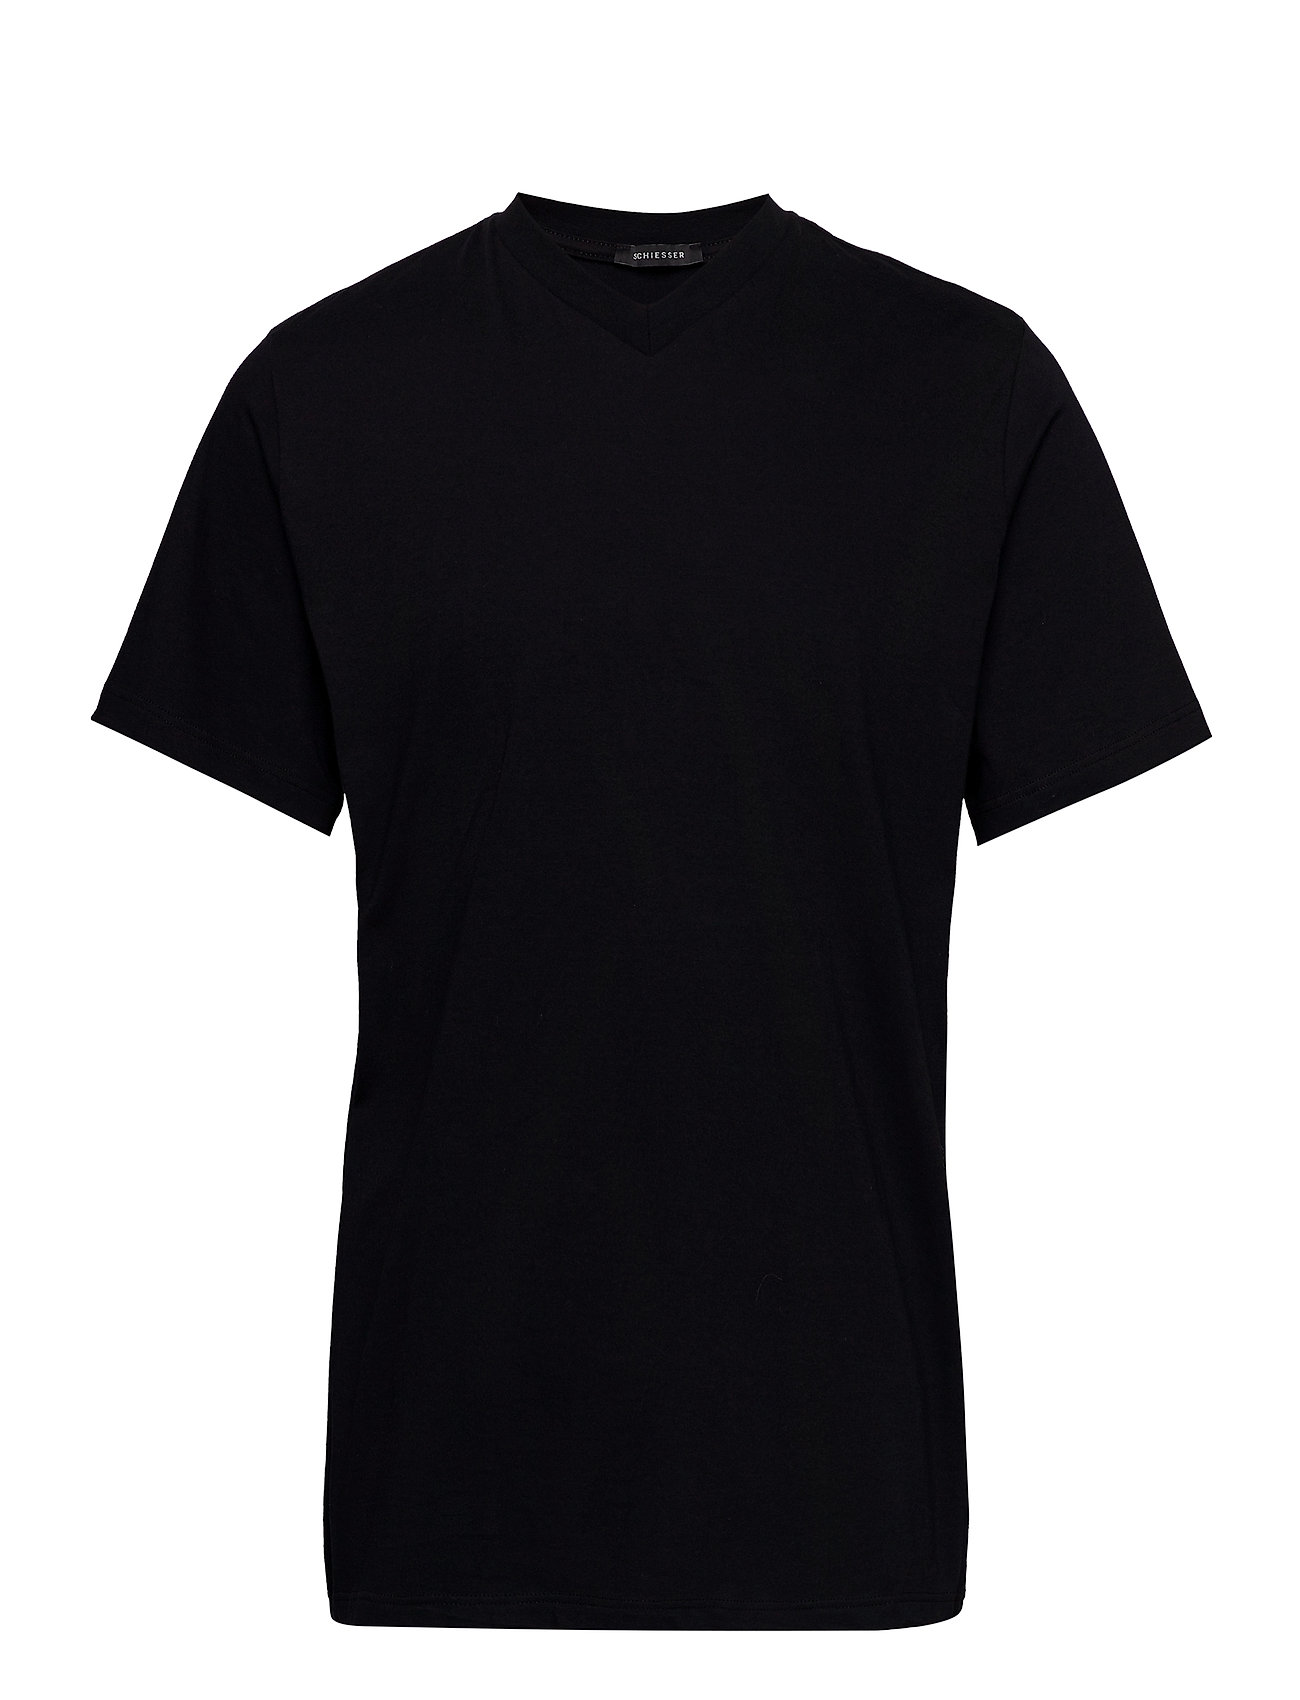 Shirt 2blackSchiesser Shirt Shirt 2blackSchiesser 1 Shirt 1 1 2blackSchiesser Shirt 2blackSchiesser 2blackSchiesser 1 1 IEDW9Y2H